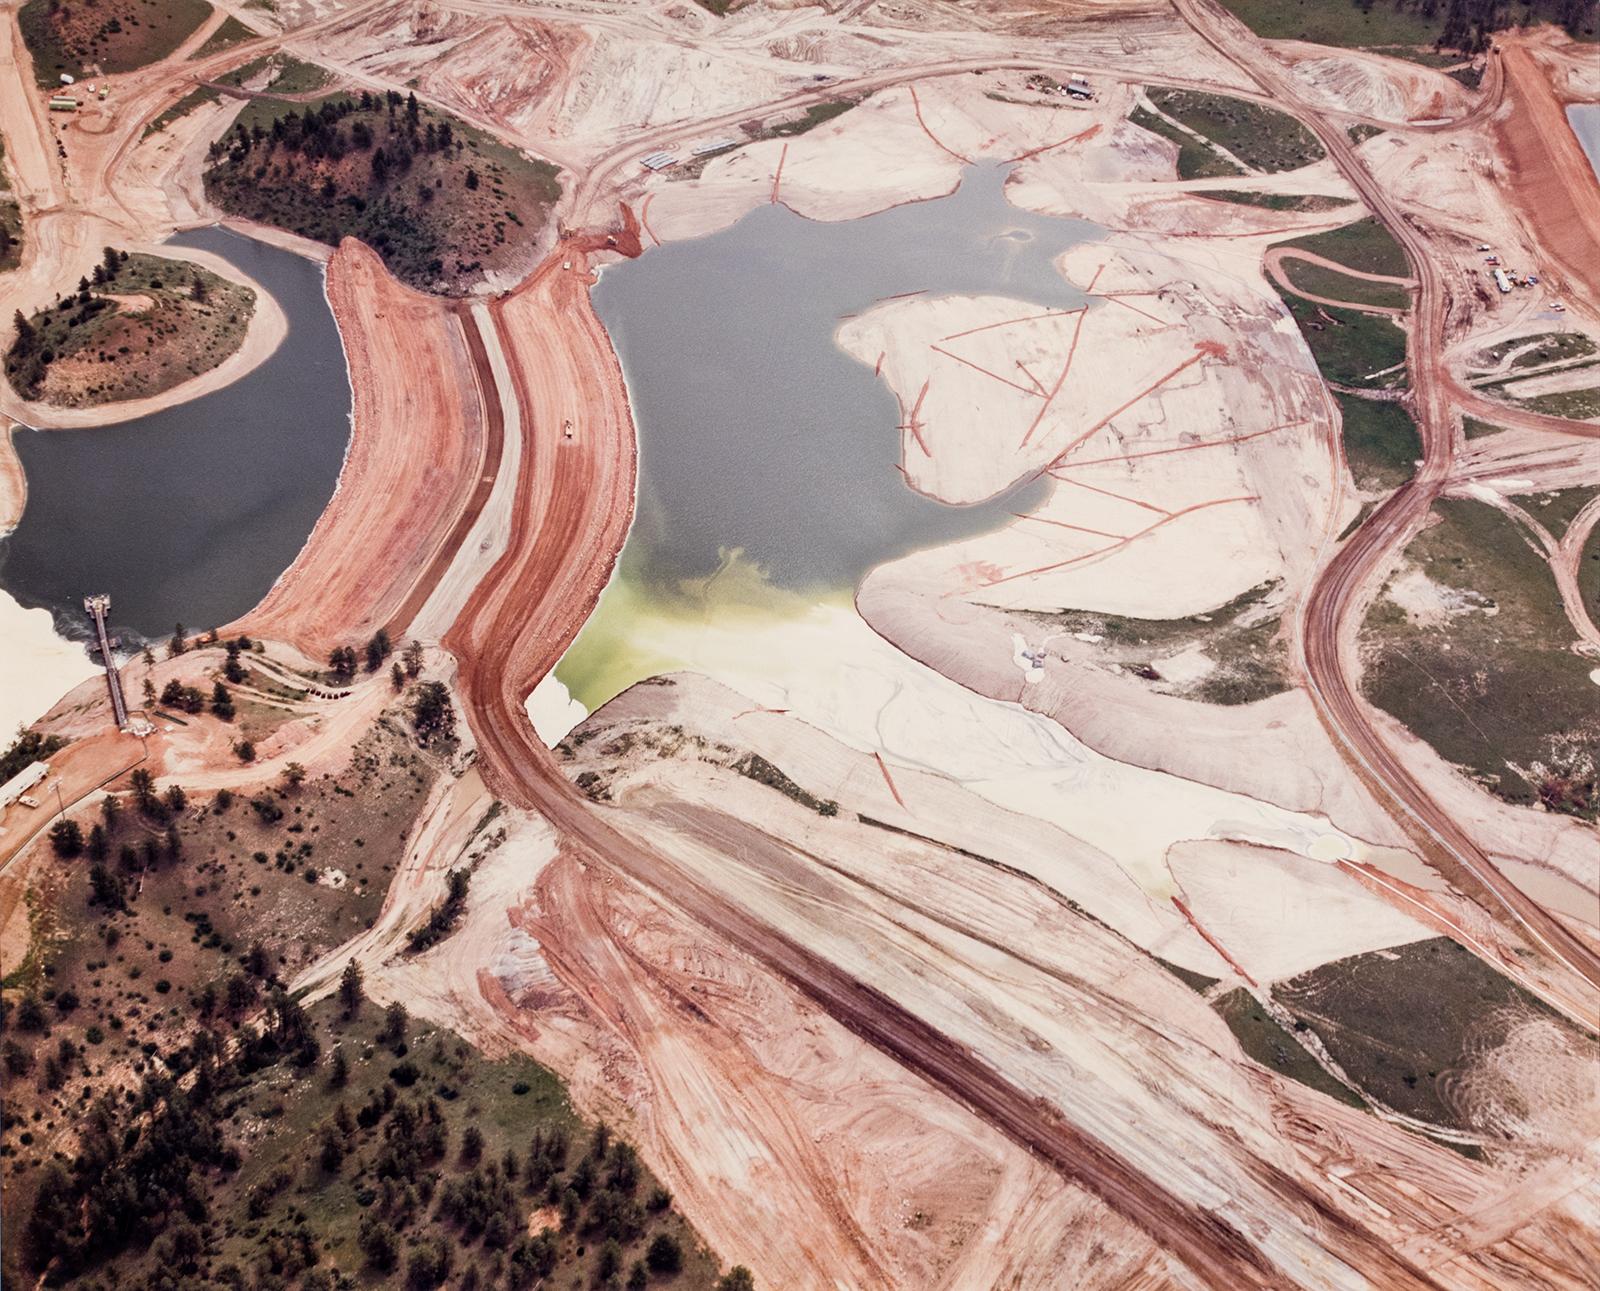 David Taverner Hanson, Excavation, deforestation, and waste pond